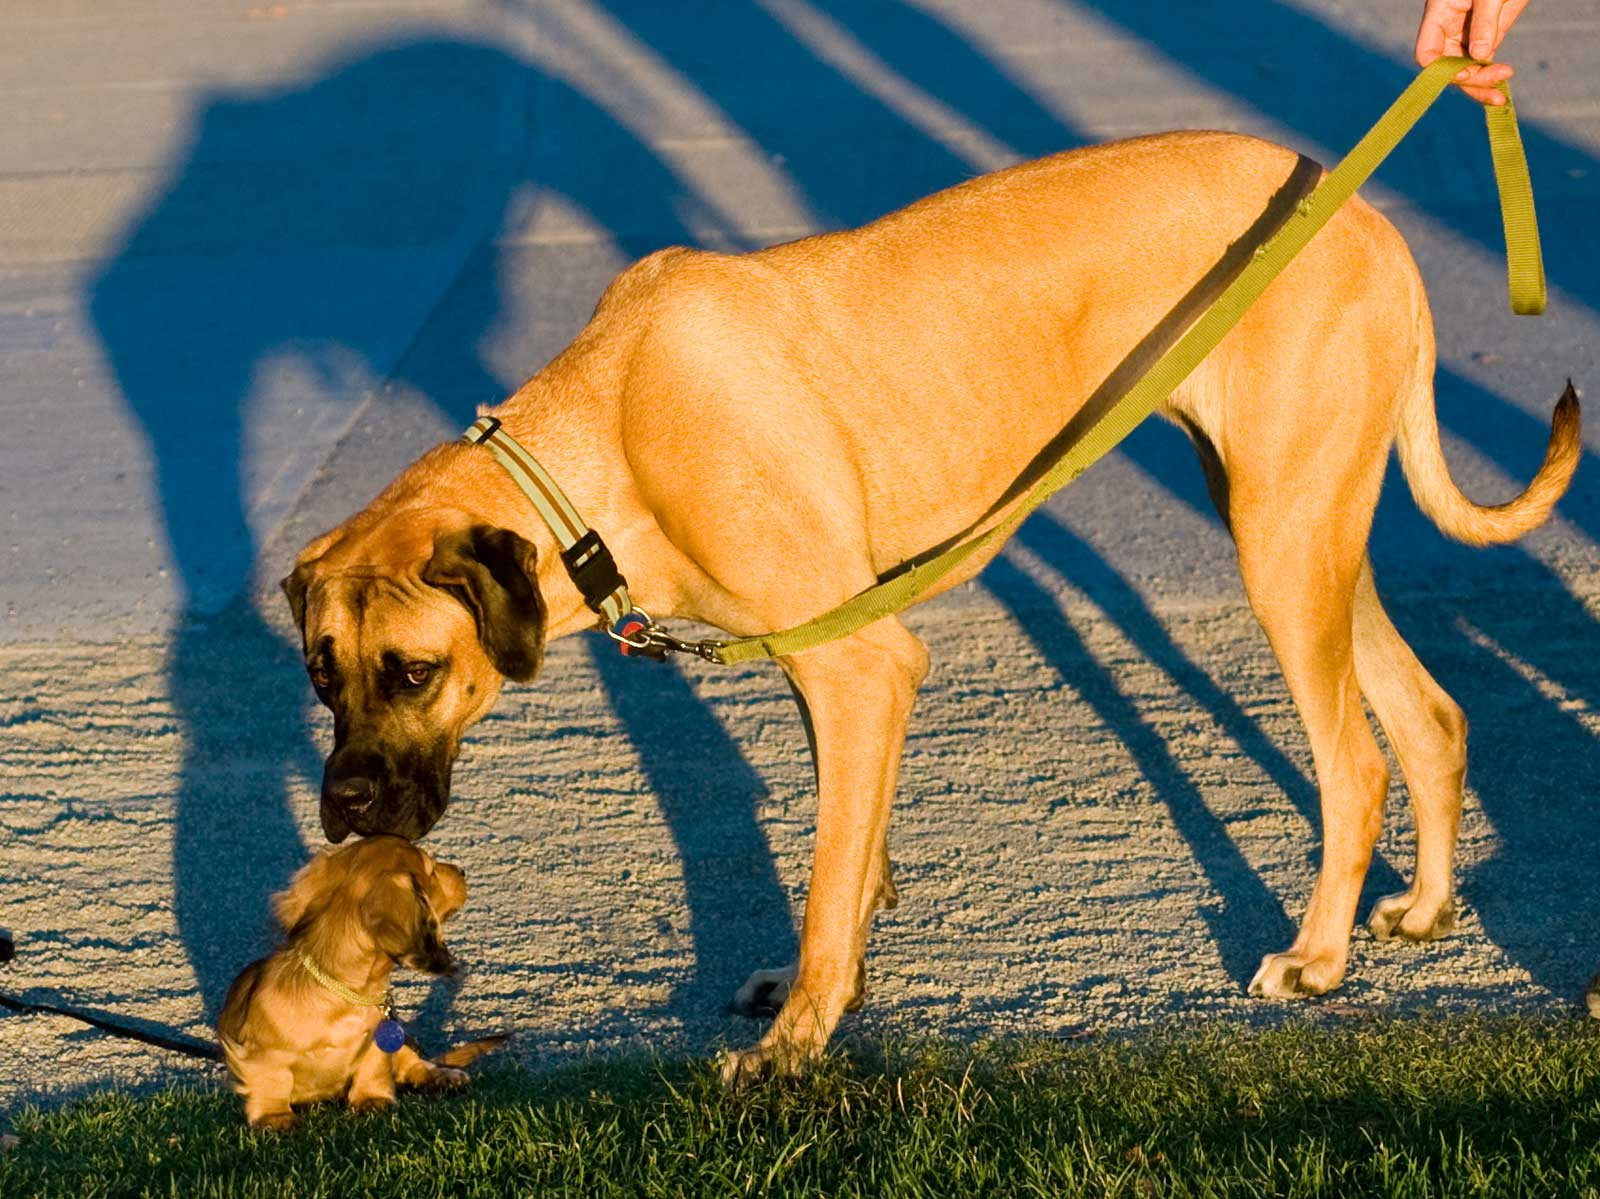 File:Big and small dog.jpg - Wikimedia Commons